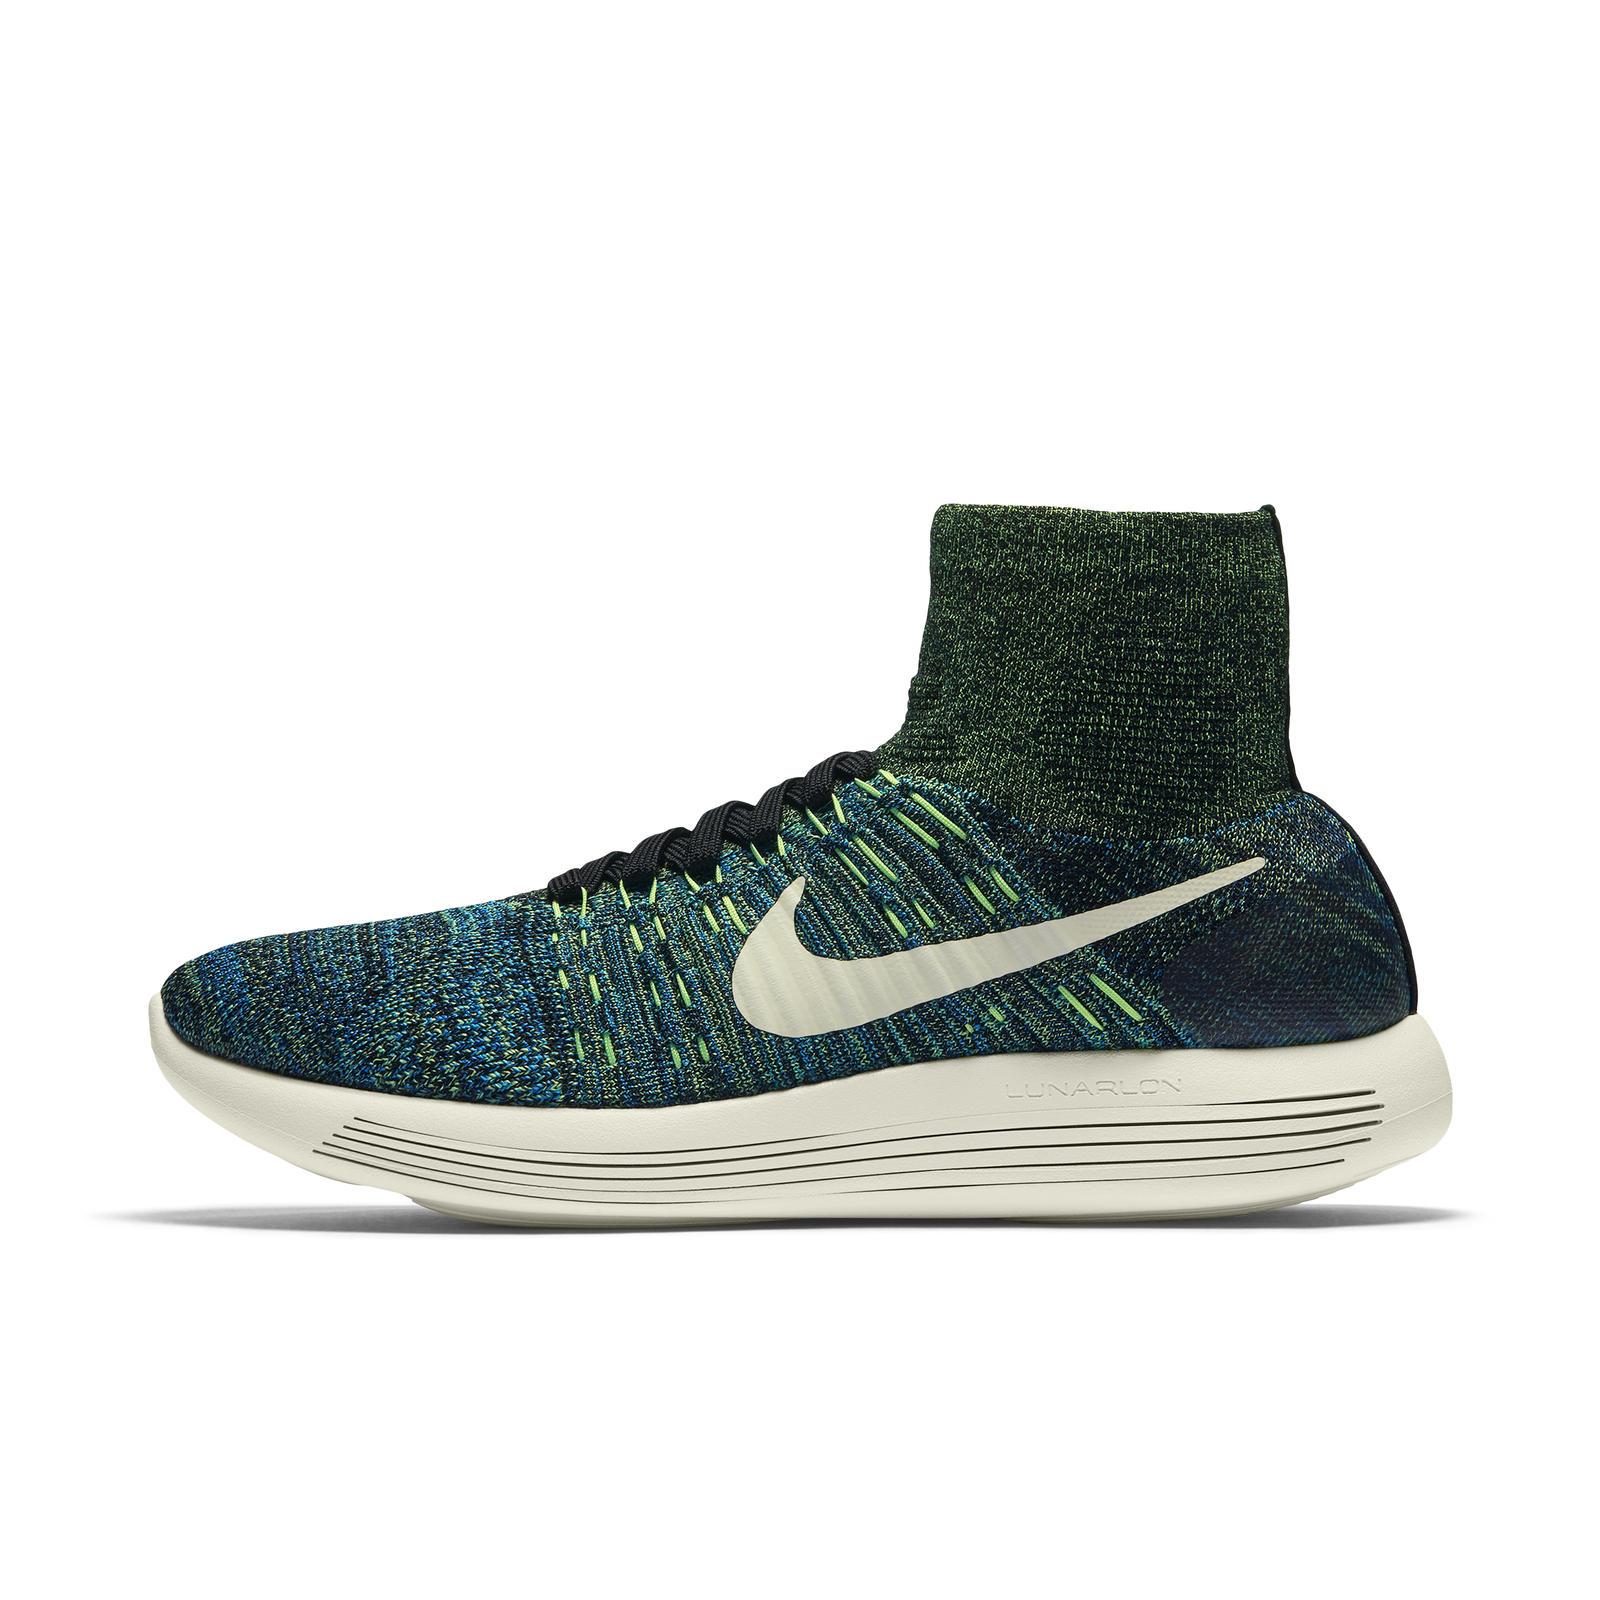 check out eccba 43788 Mobile Gallery Image ... Mens Nike Lunarepic Flyknit Deep Royal Blue Black  Volt Running Shoes 818676 400 Nike LunarEpic Flyknit Shoelace Sizes Exact  ...